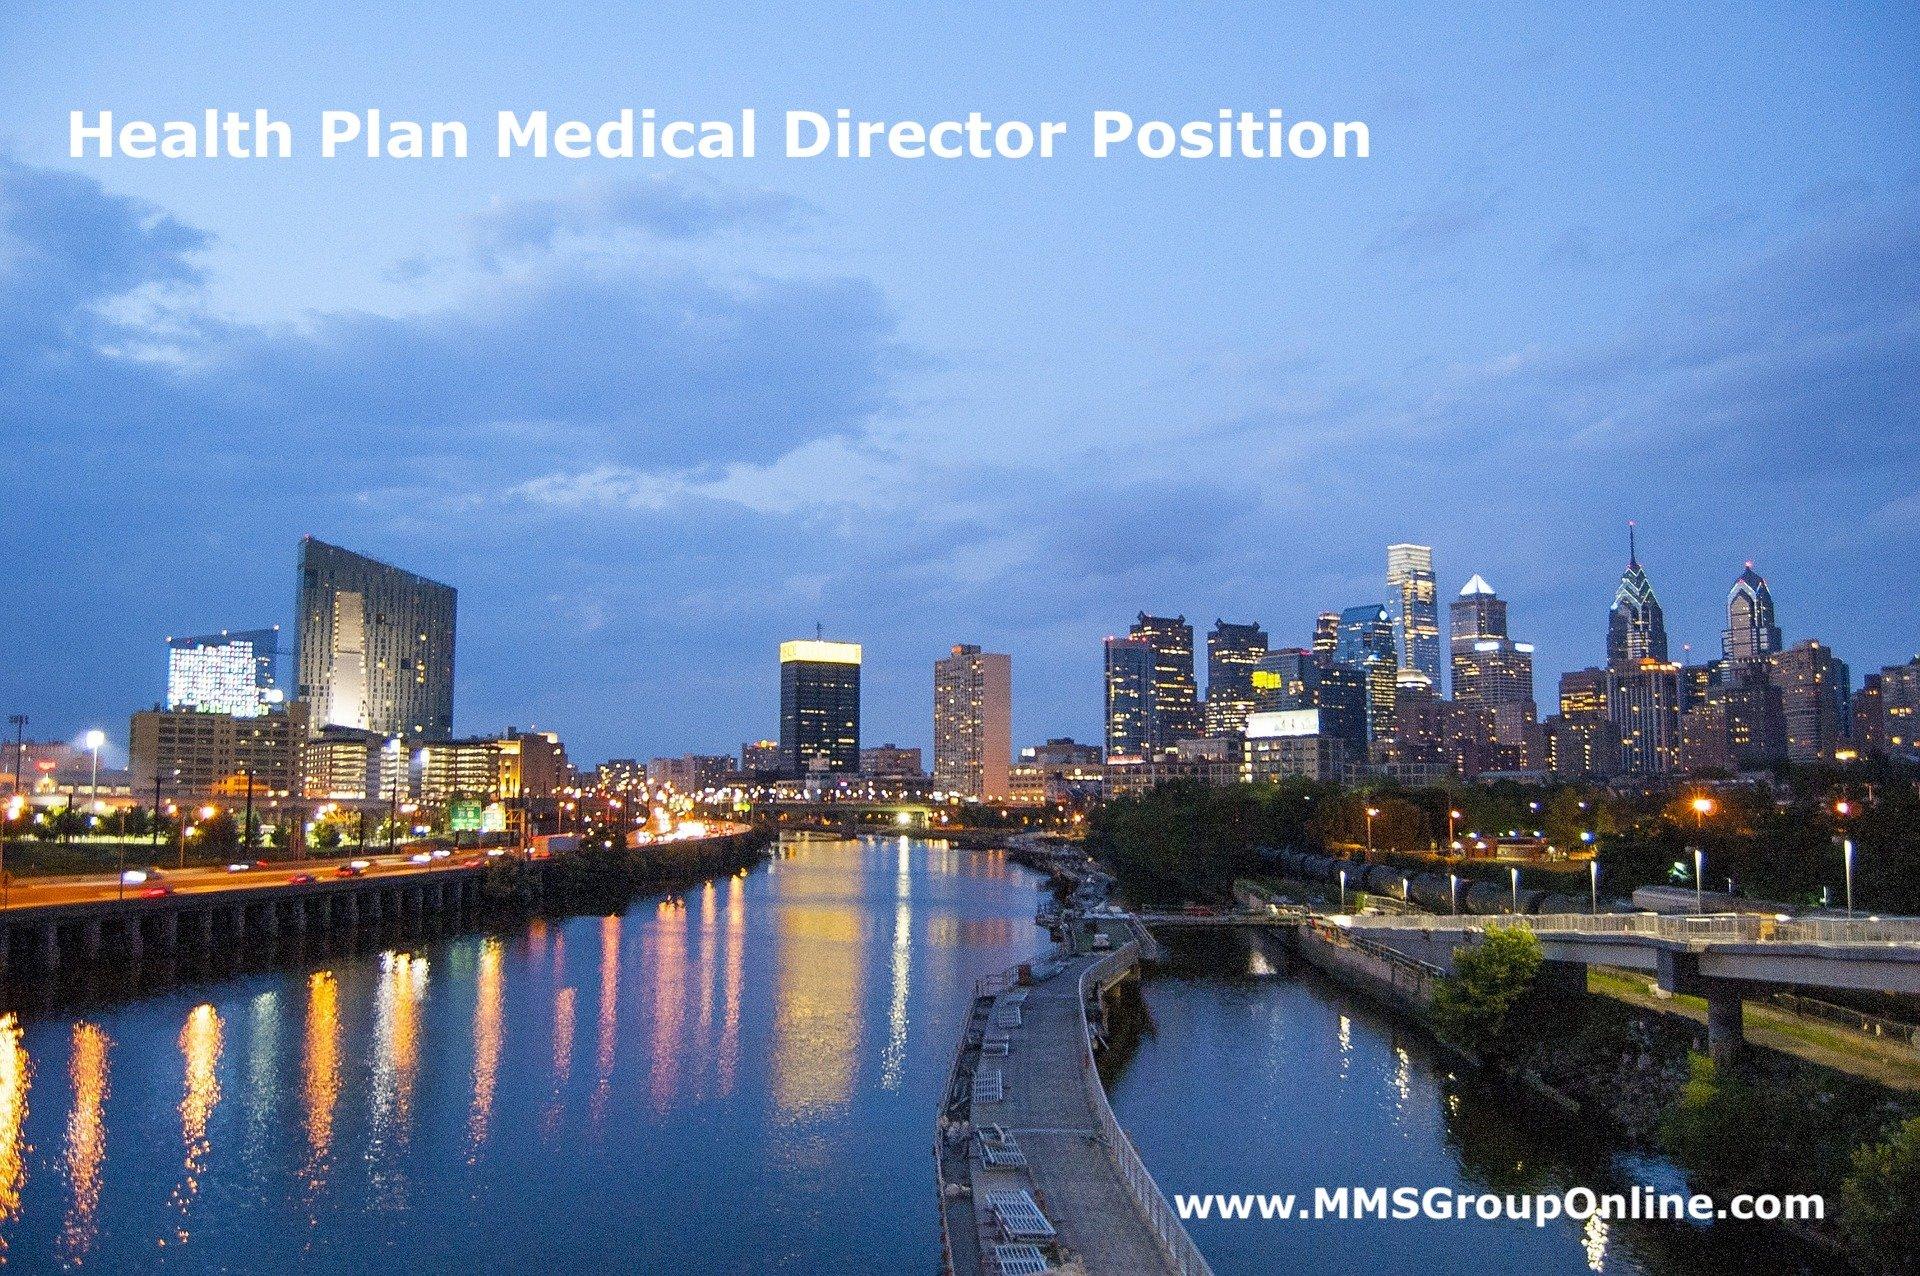 Health Plan Medical Director Job in Philadelphia PA